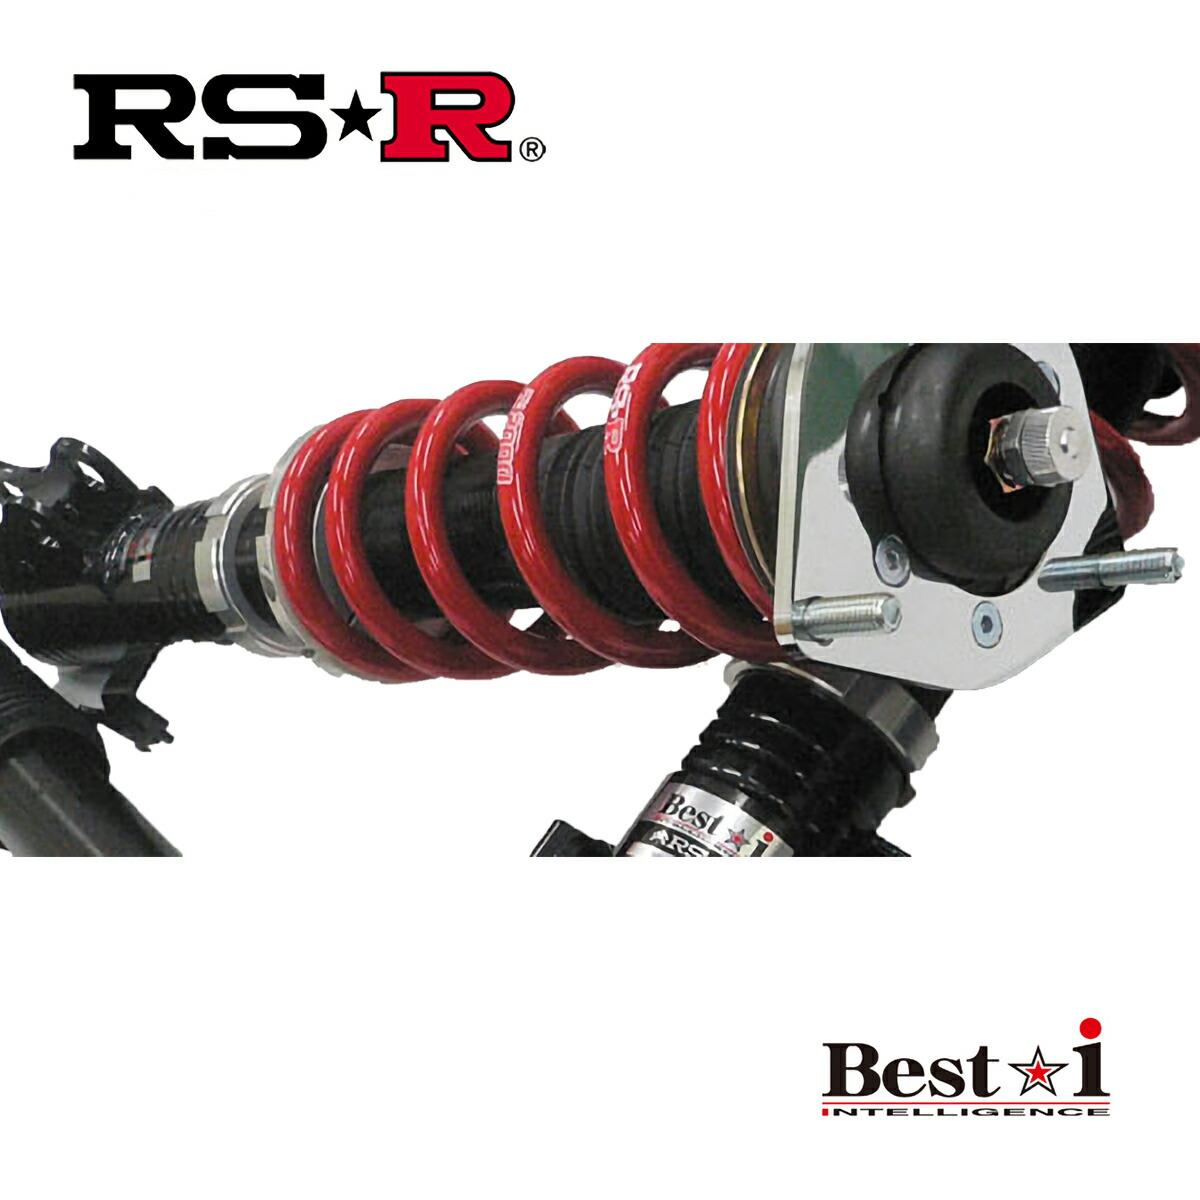 RS-R BMW 5シリーズ G30 JC20 523d Mスポーツ 車高調 リア車高調整: 全長式 BIBM051M ベストi RSR 個人宅発送追金有